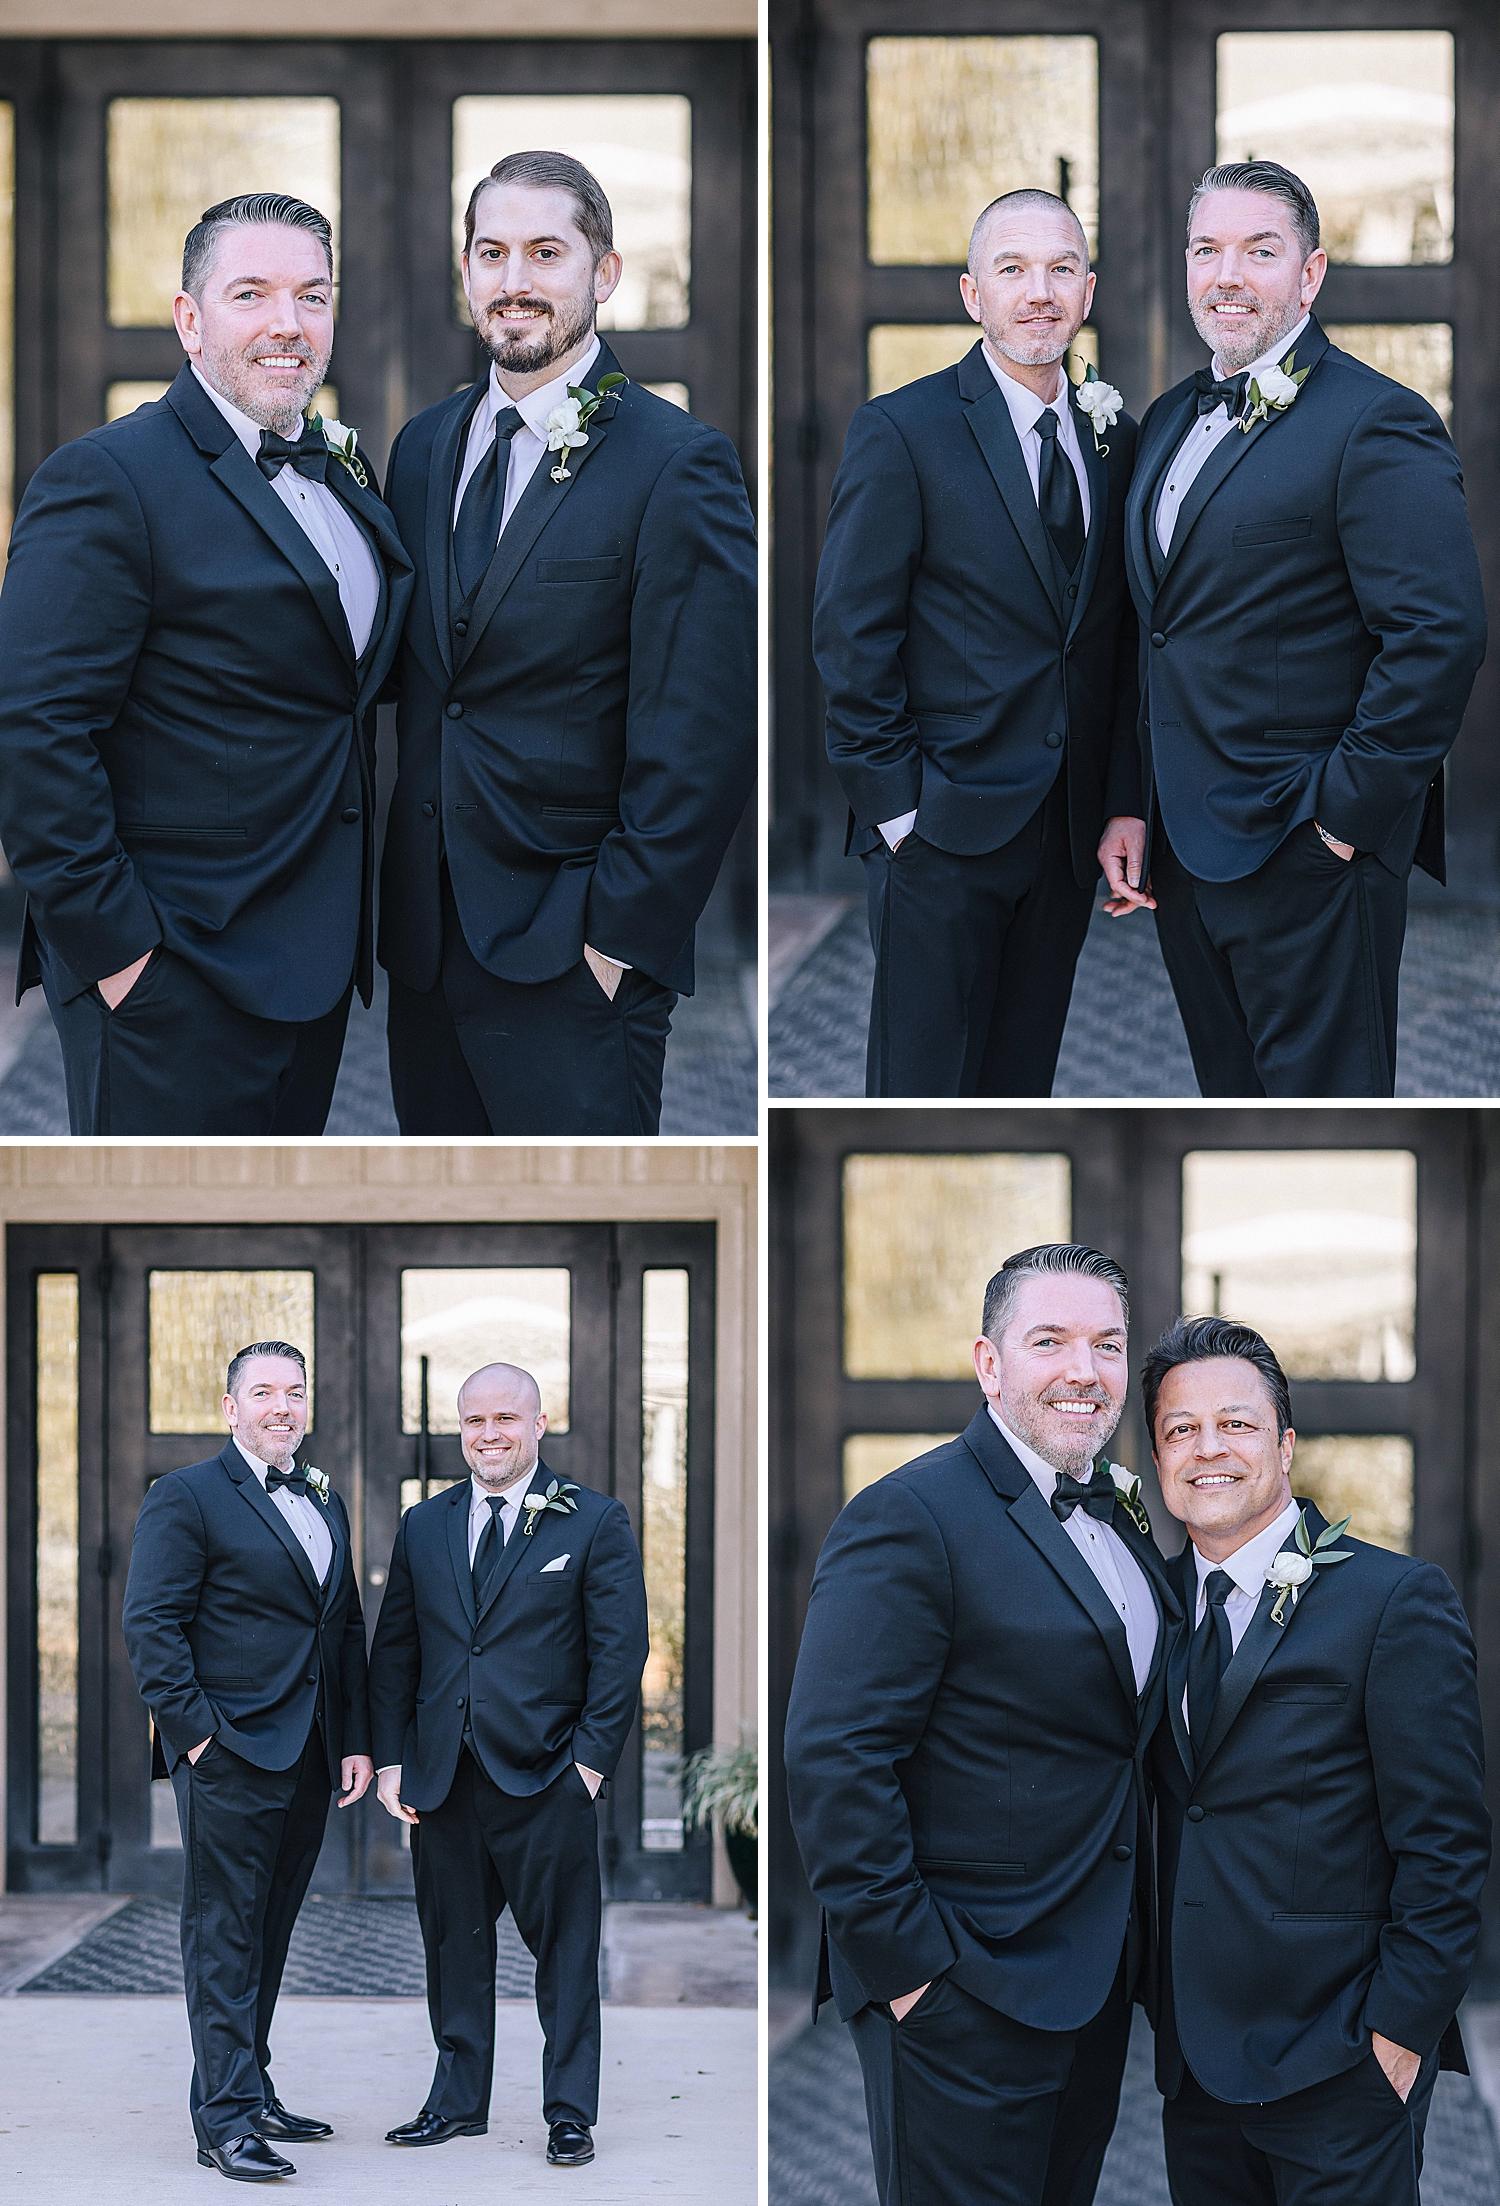 Magnolia-Halle-Wedding-San-Antonio-Texas-Bride-Grom_0030.jpg